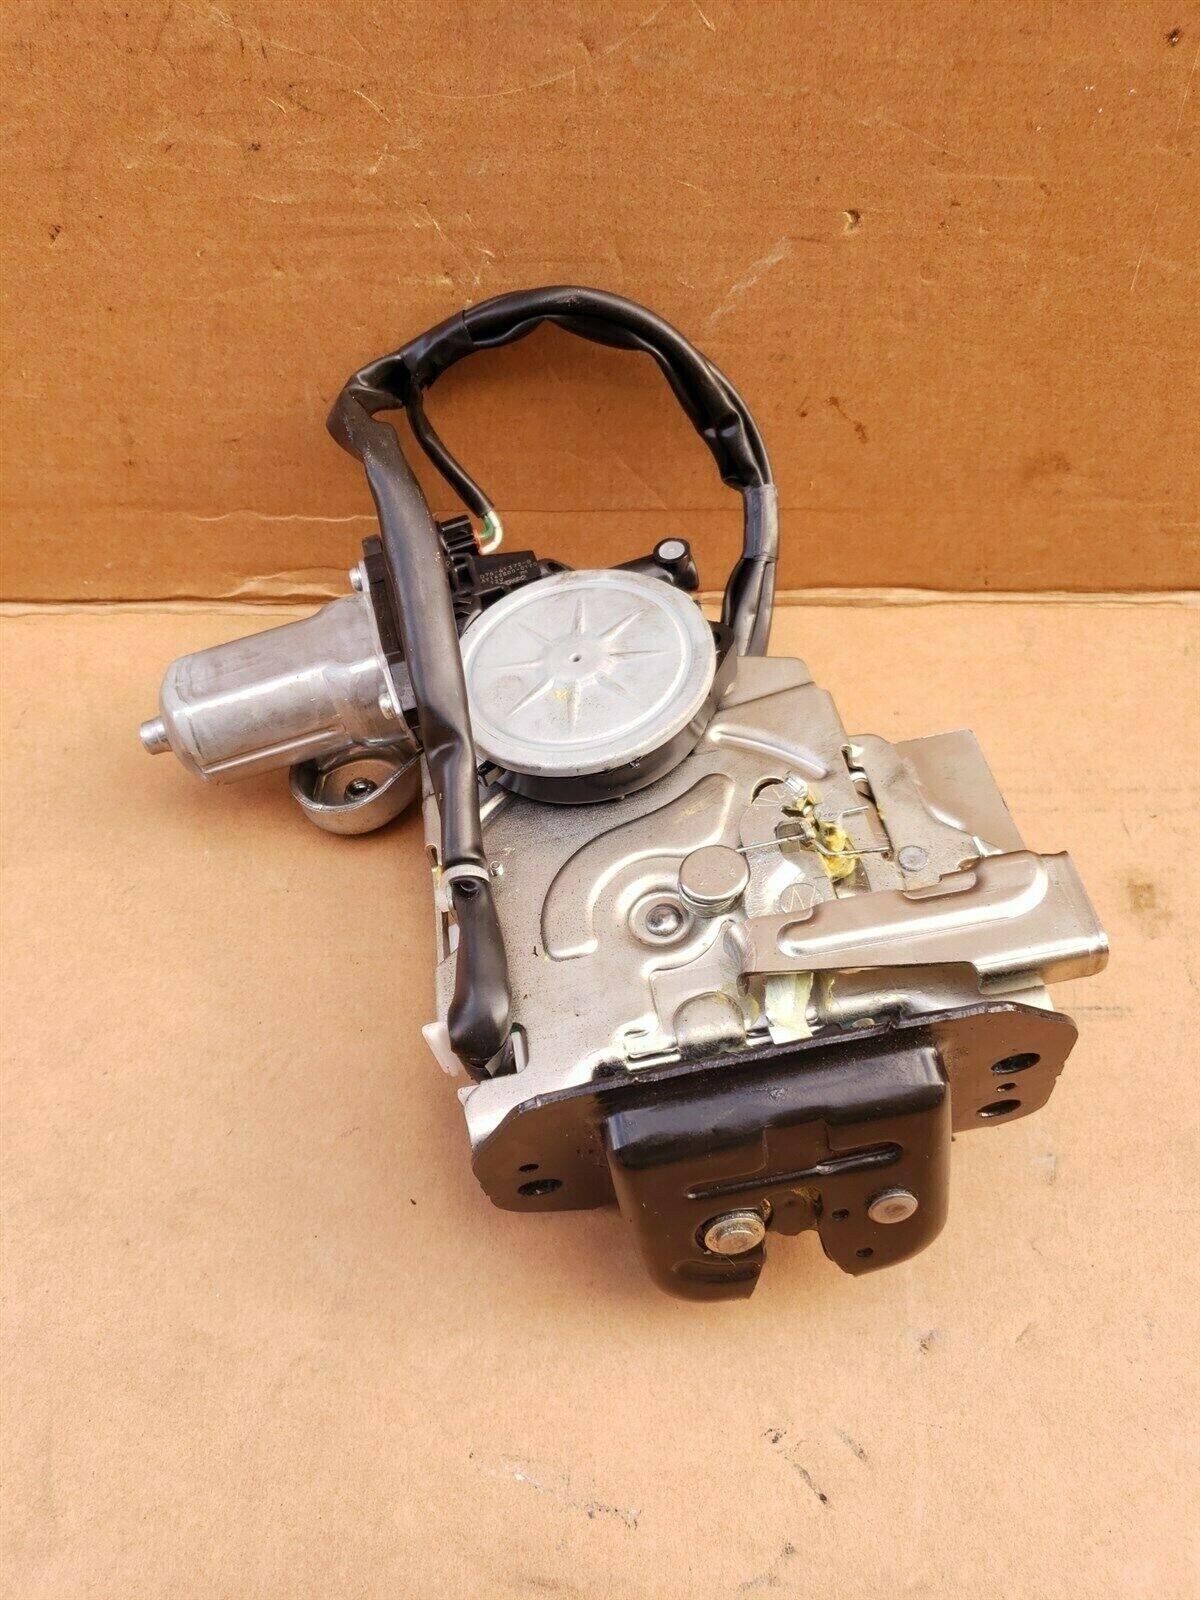 09-13 Ford Flex Rear Hatch Tailgate Liftgate Power Lock Latch Motor Actuator